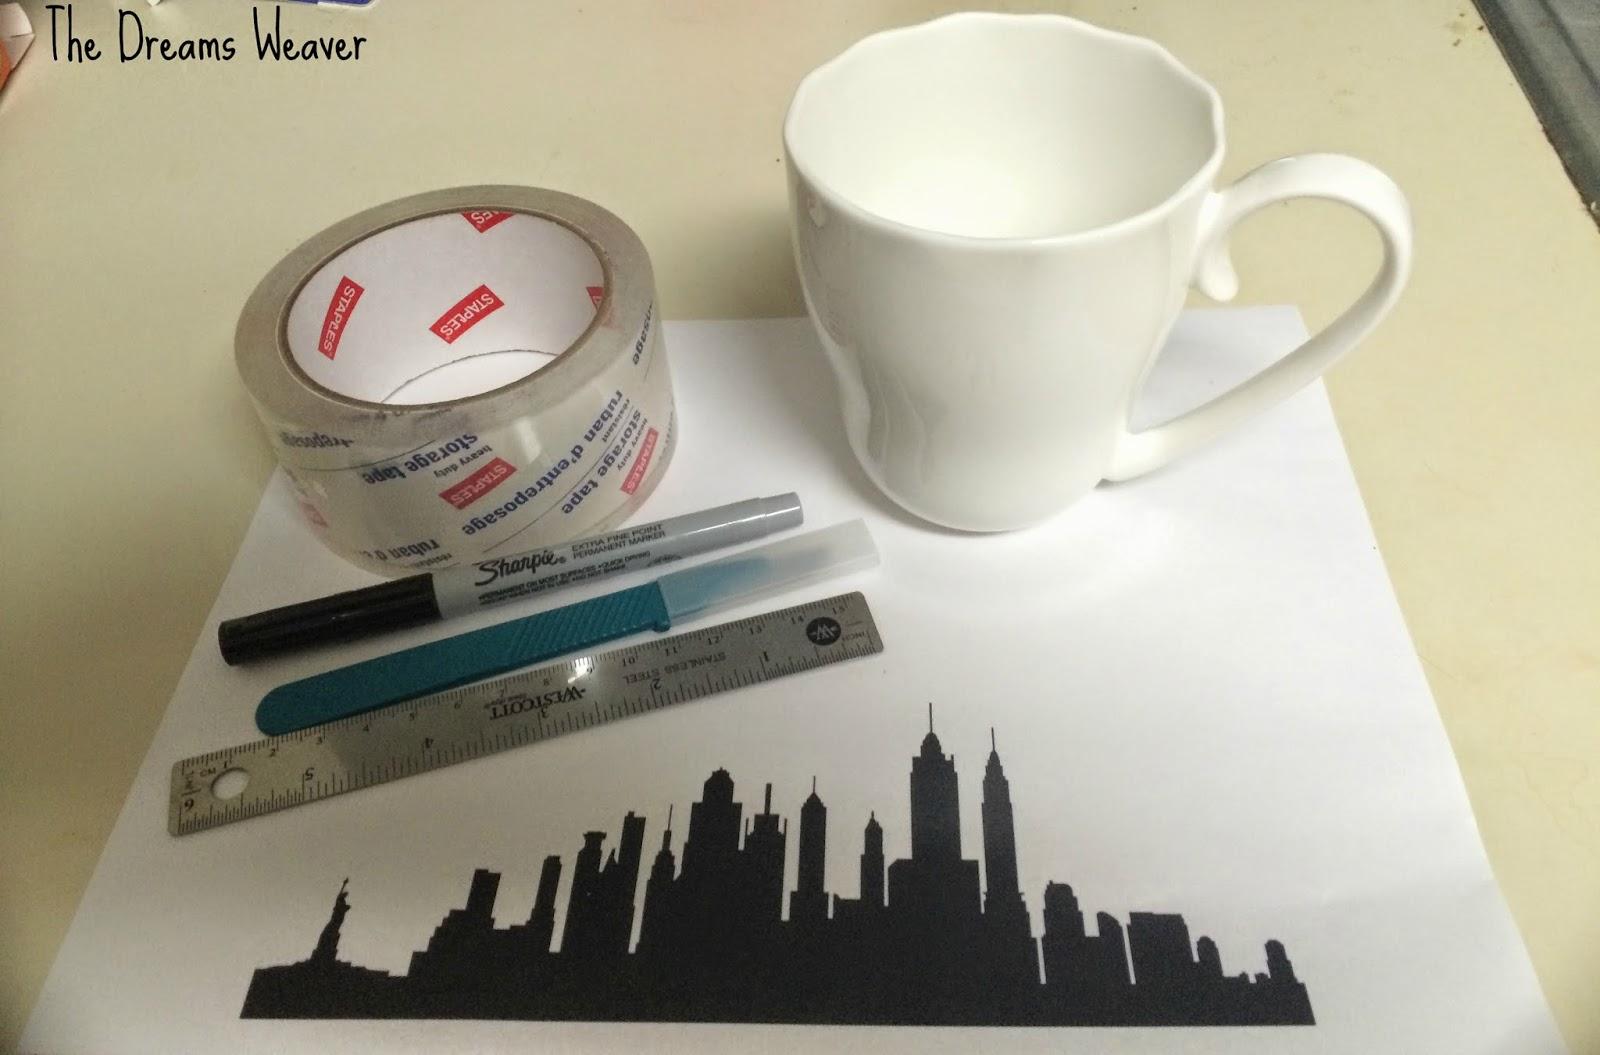 Sharpie Painted Ceramic Mug~ The Dreams Weaver